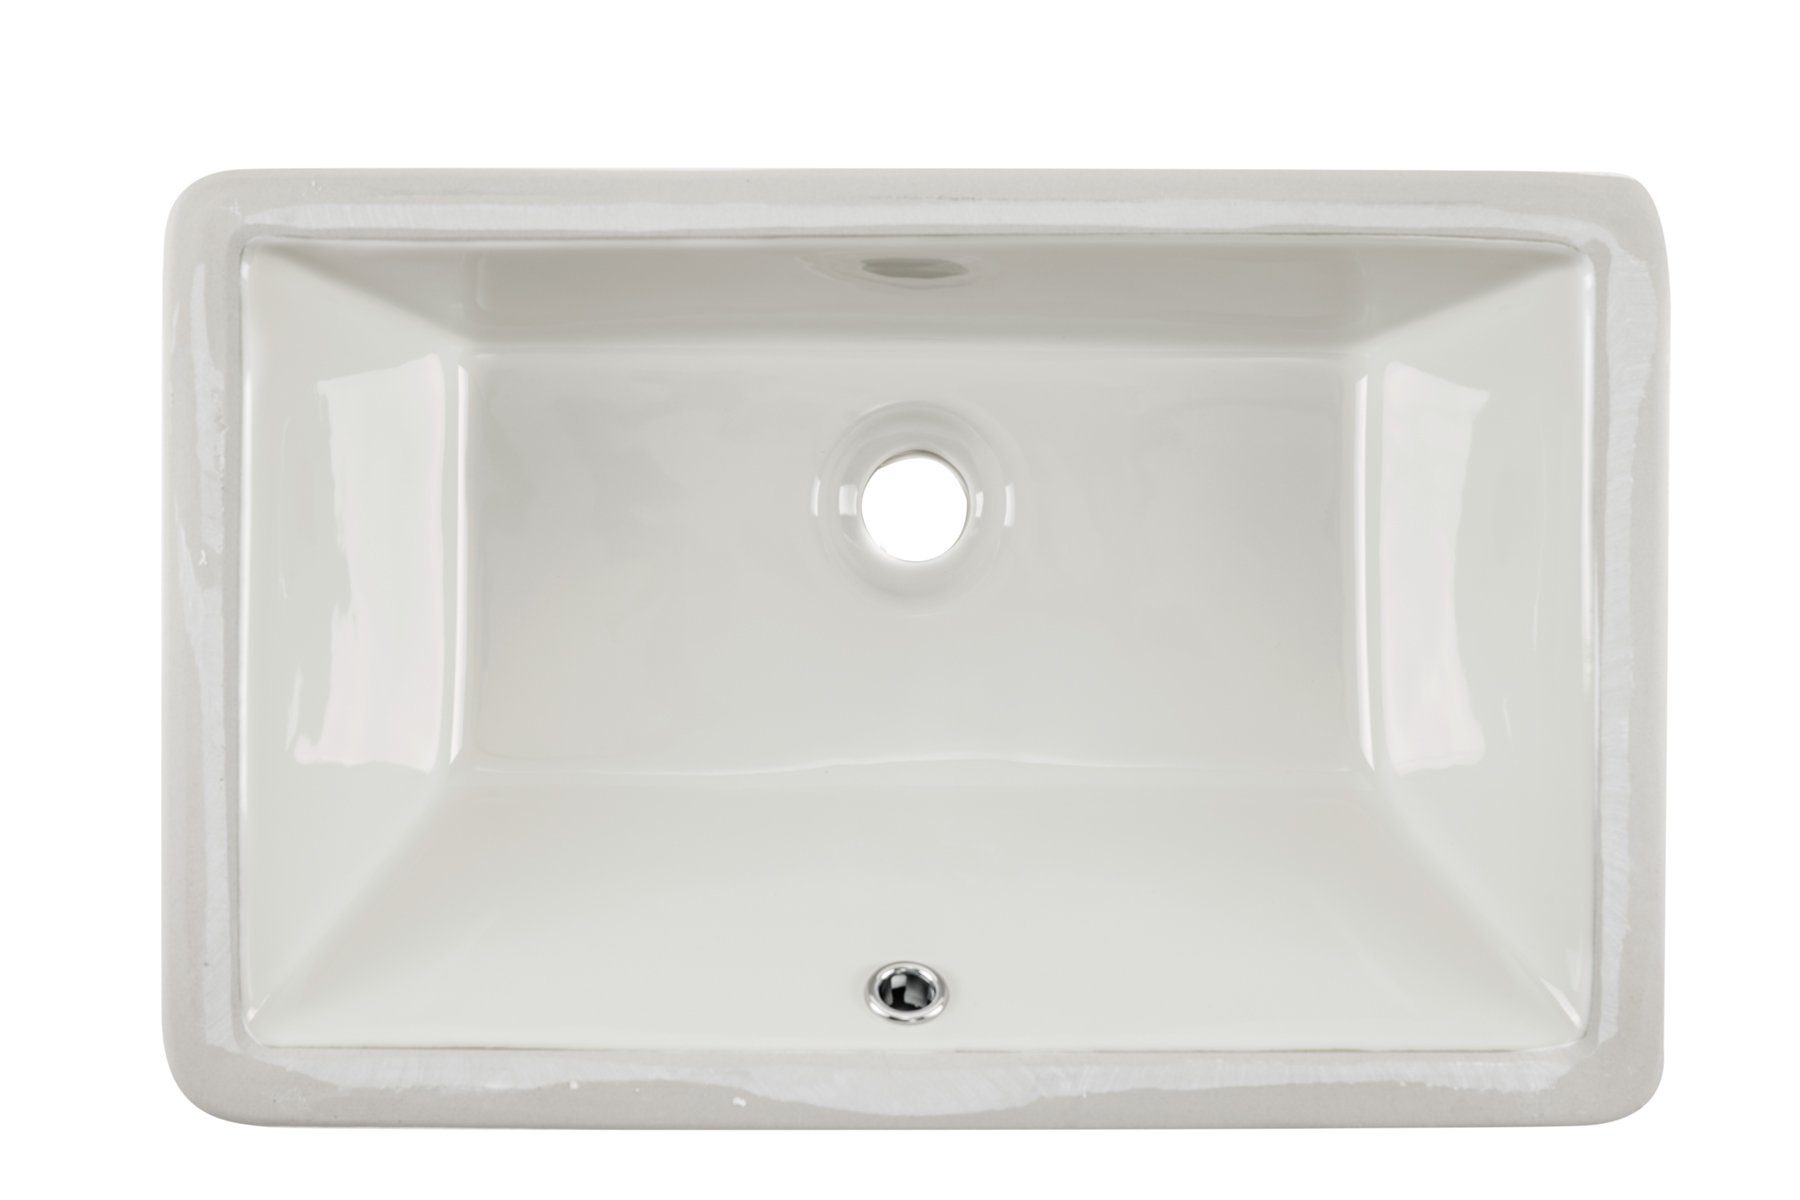 1181CBB 18-1/2'' x 11'' Bisque Rectangular Porcelain Undermount Lavatory Bathroom Sink by Magnus Sinks